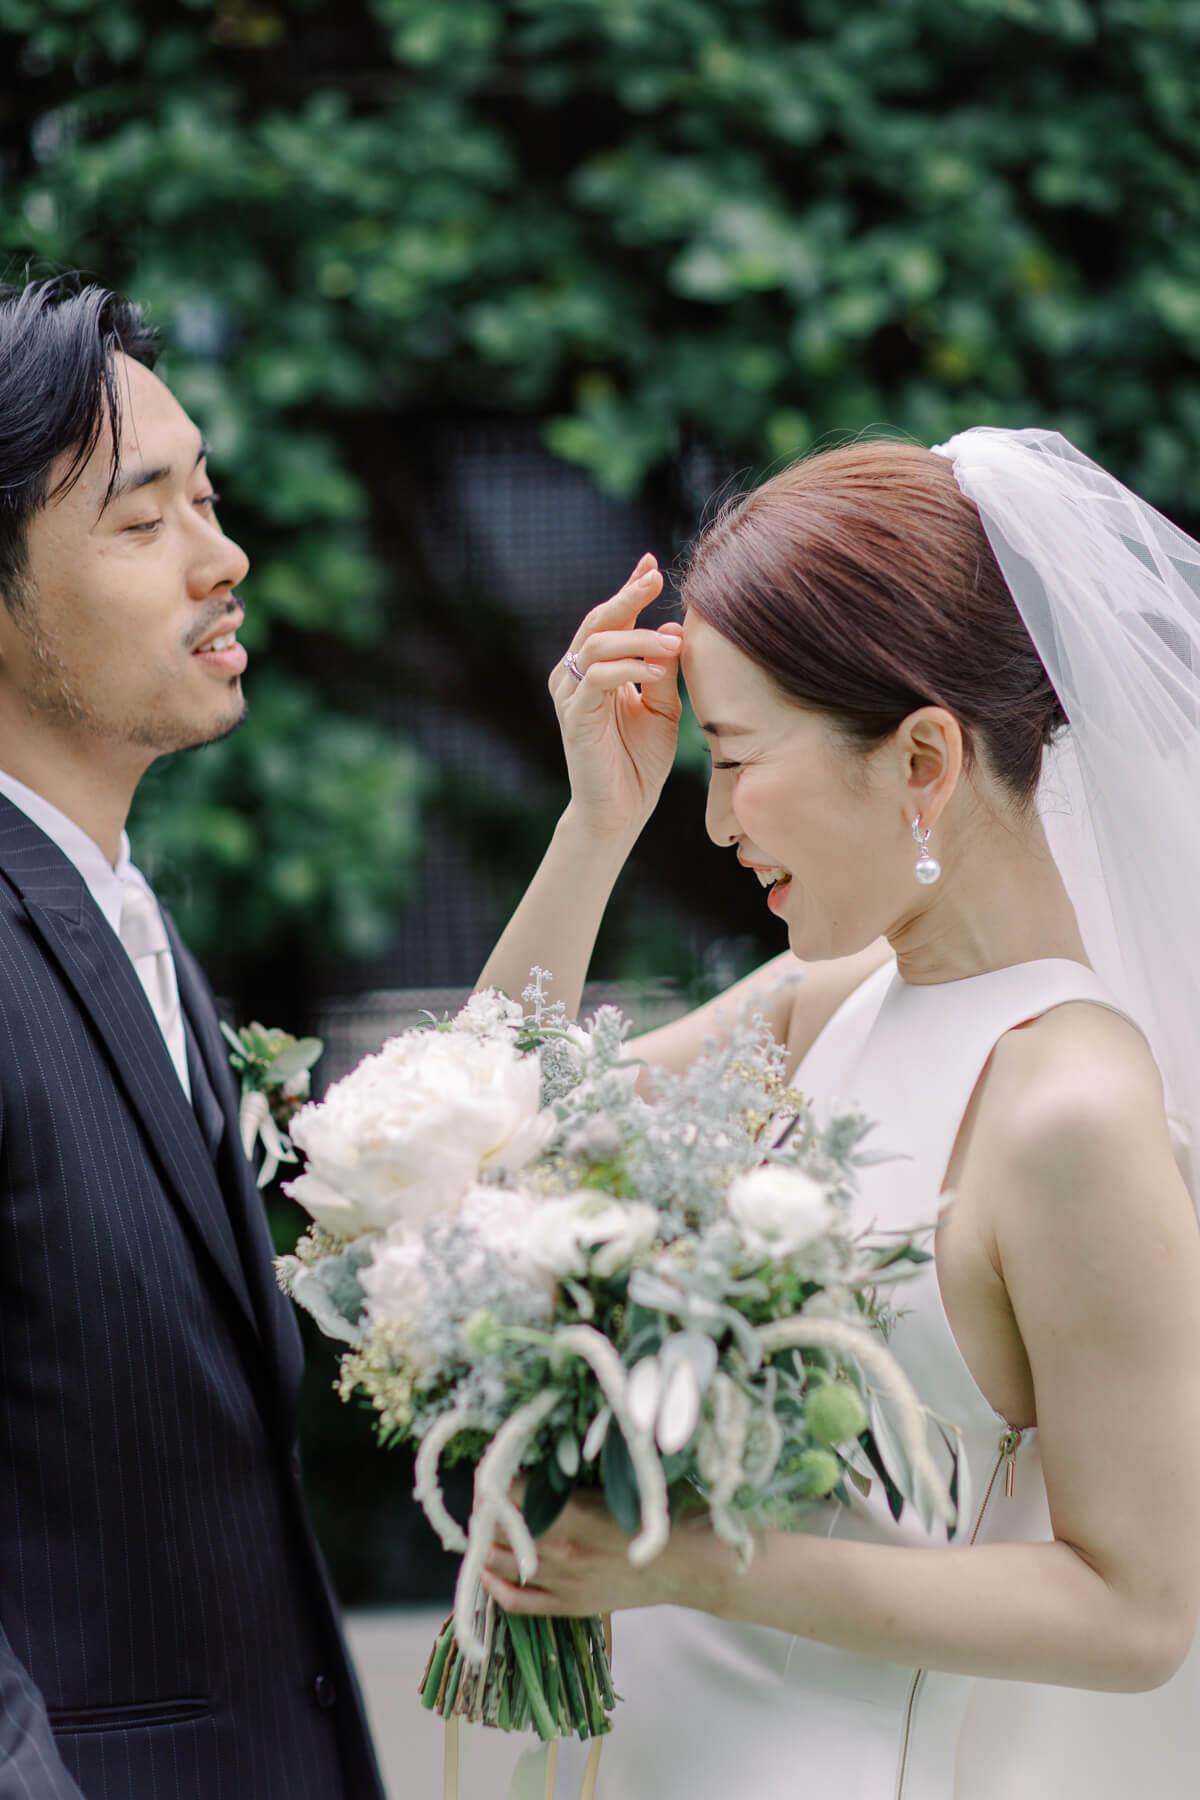 nikkiloveu-hongkong-weddingday-theupperhouse-as-022.jpg